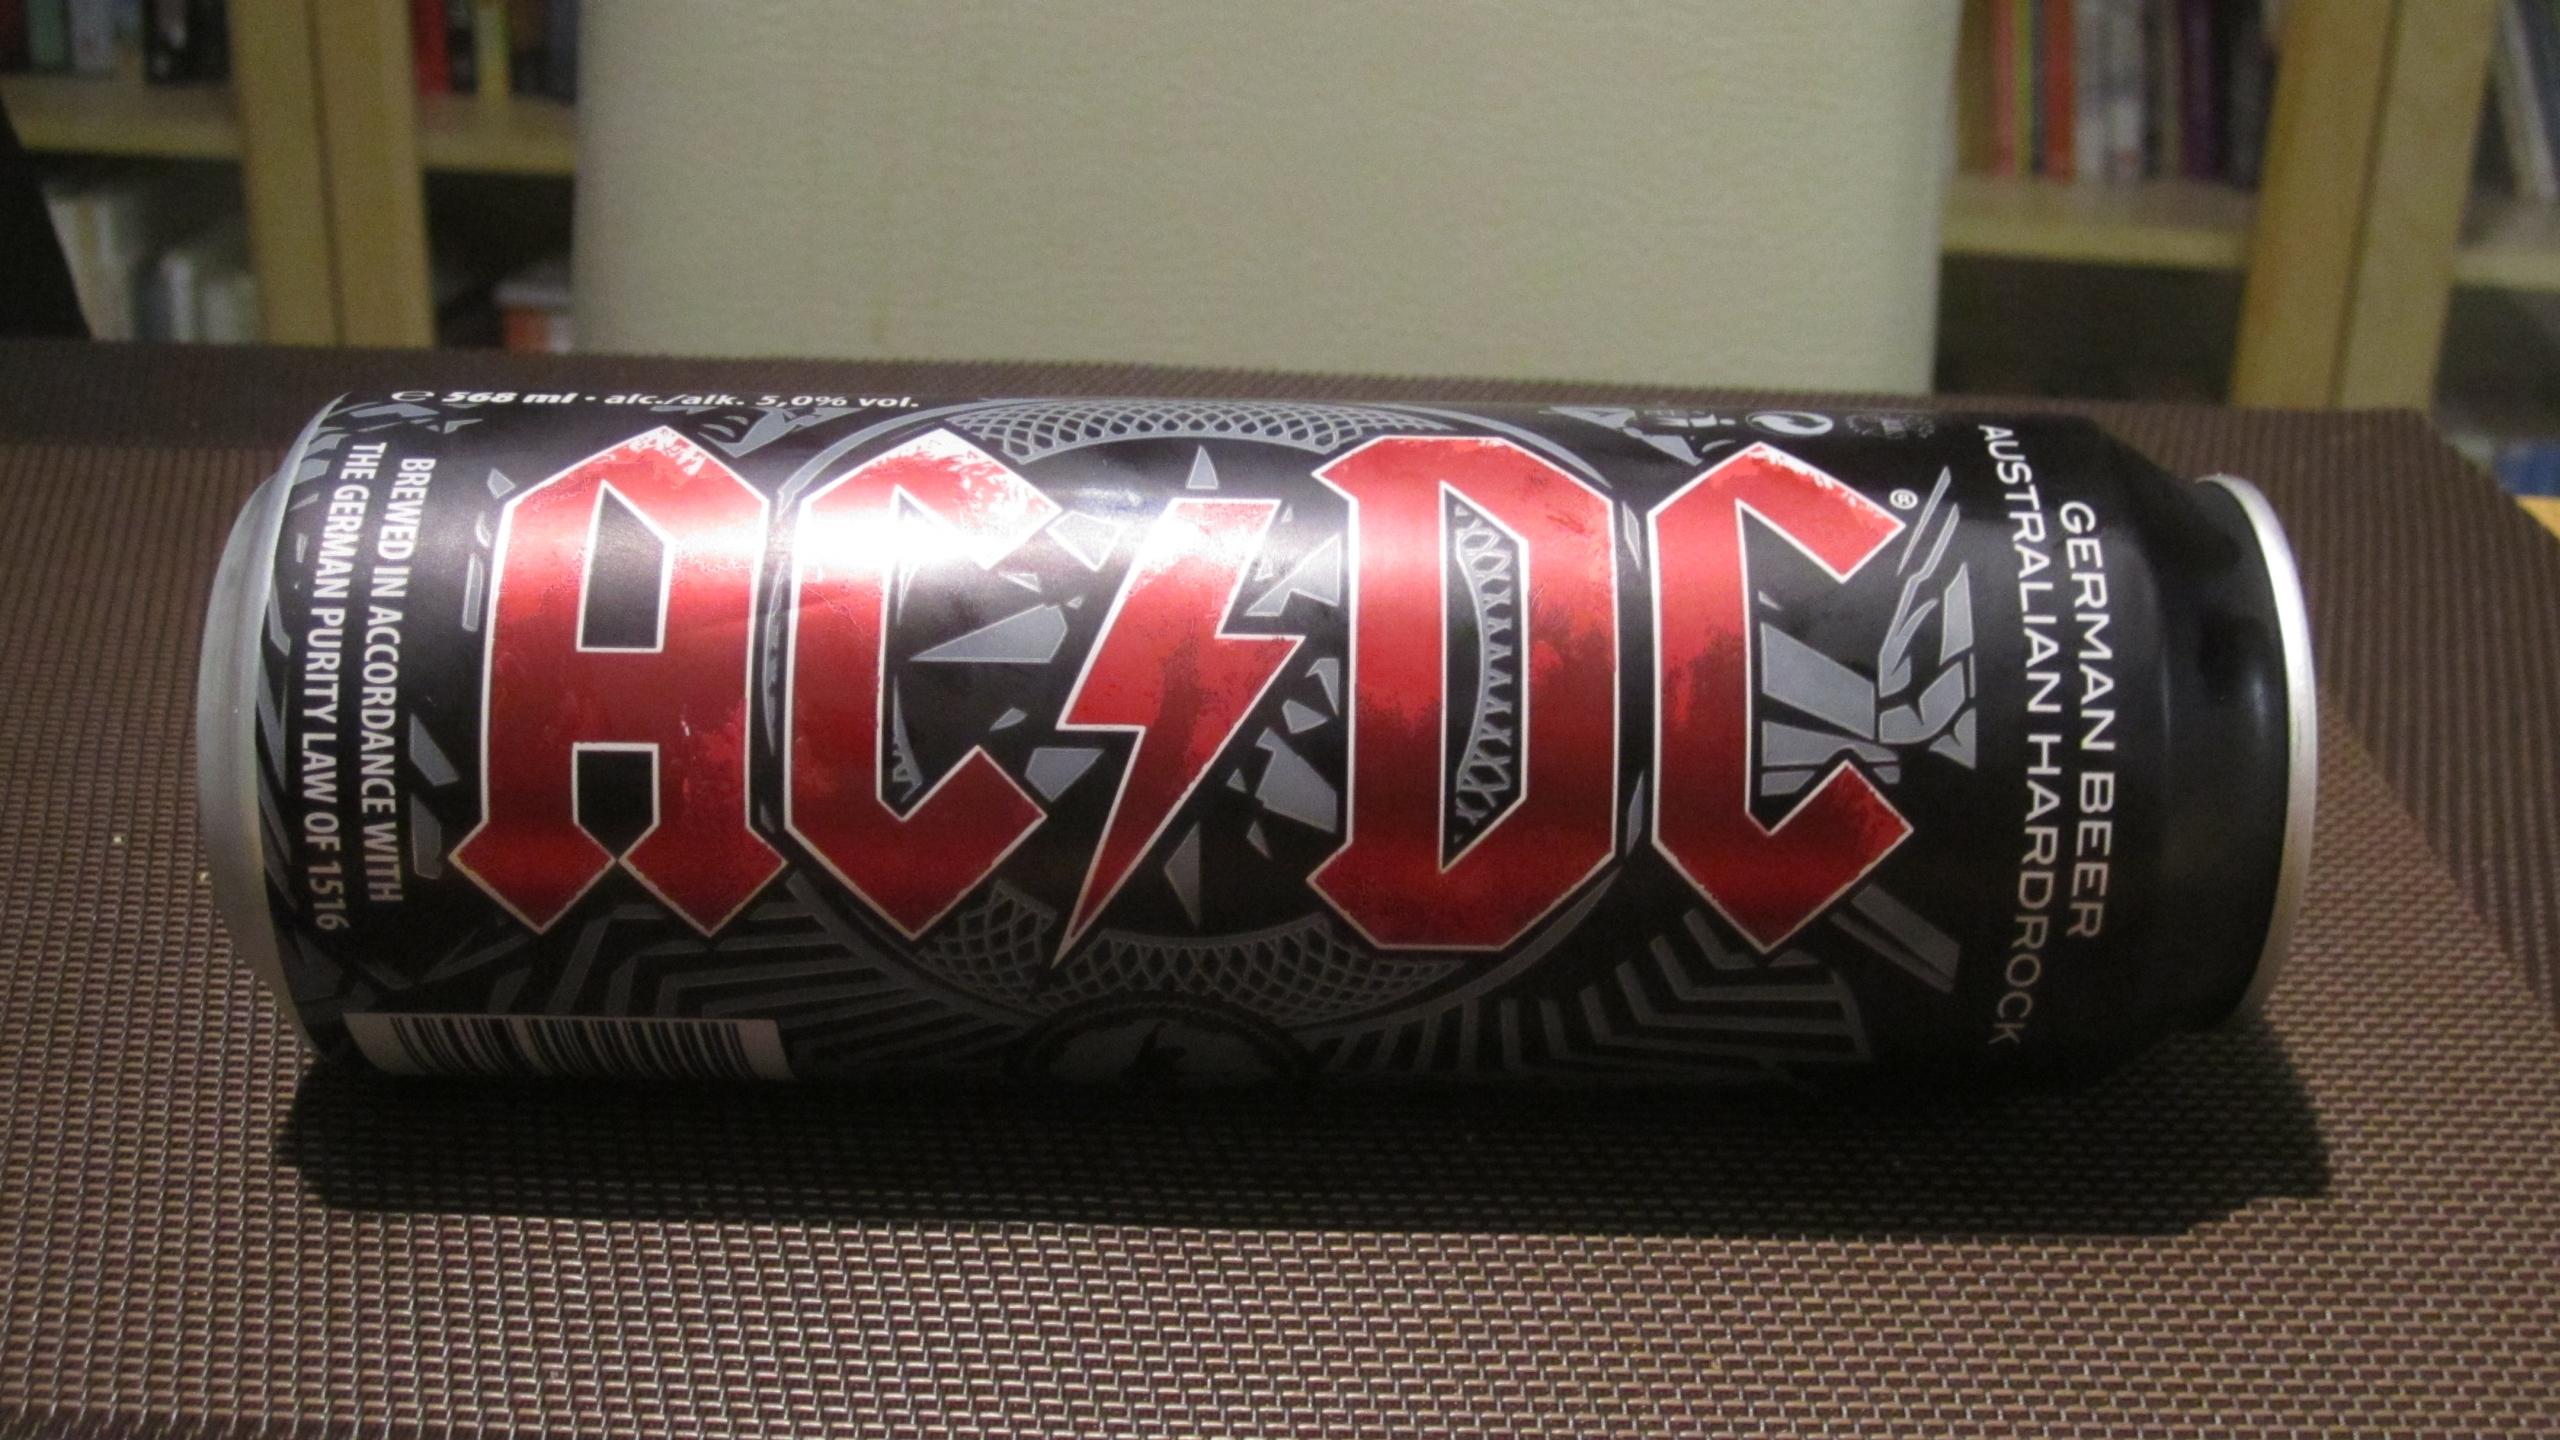 Nice Images Collection: AC DC Beer Desktop Wallpapers